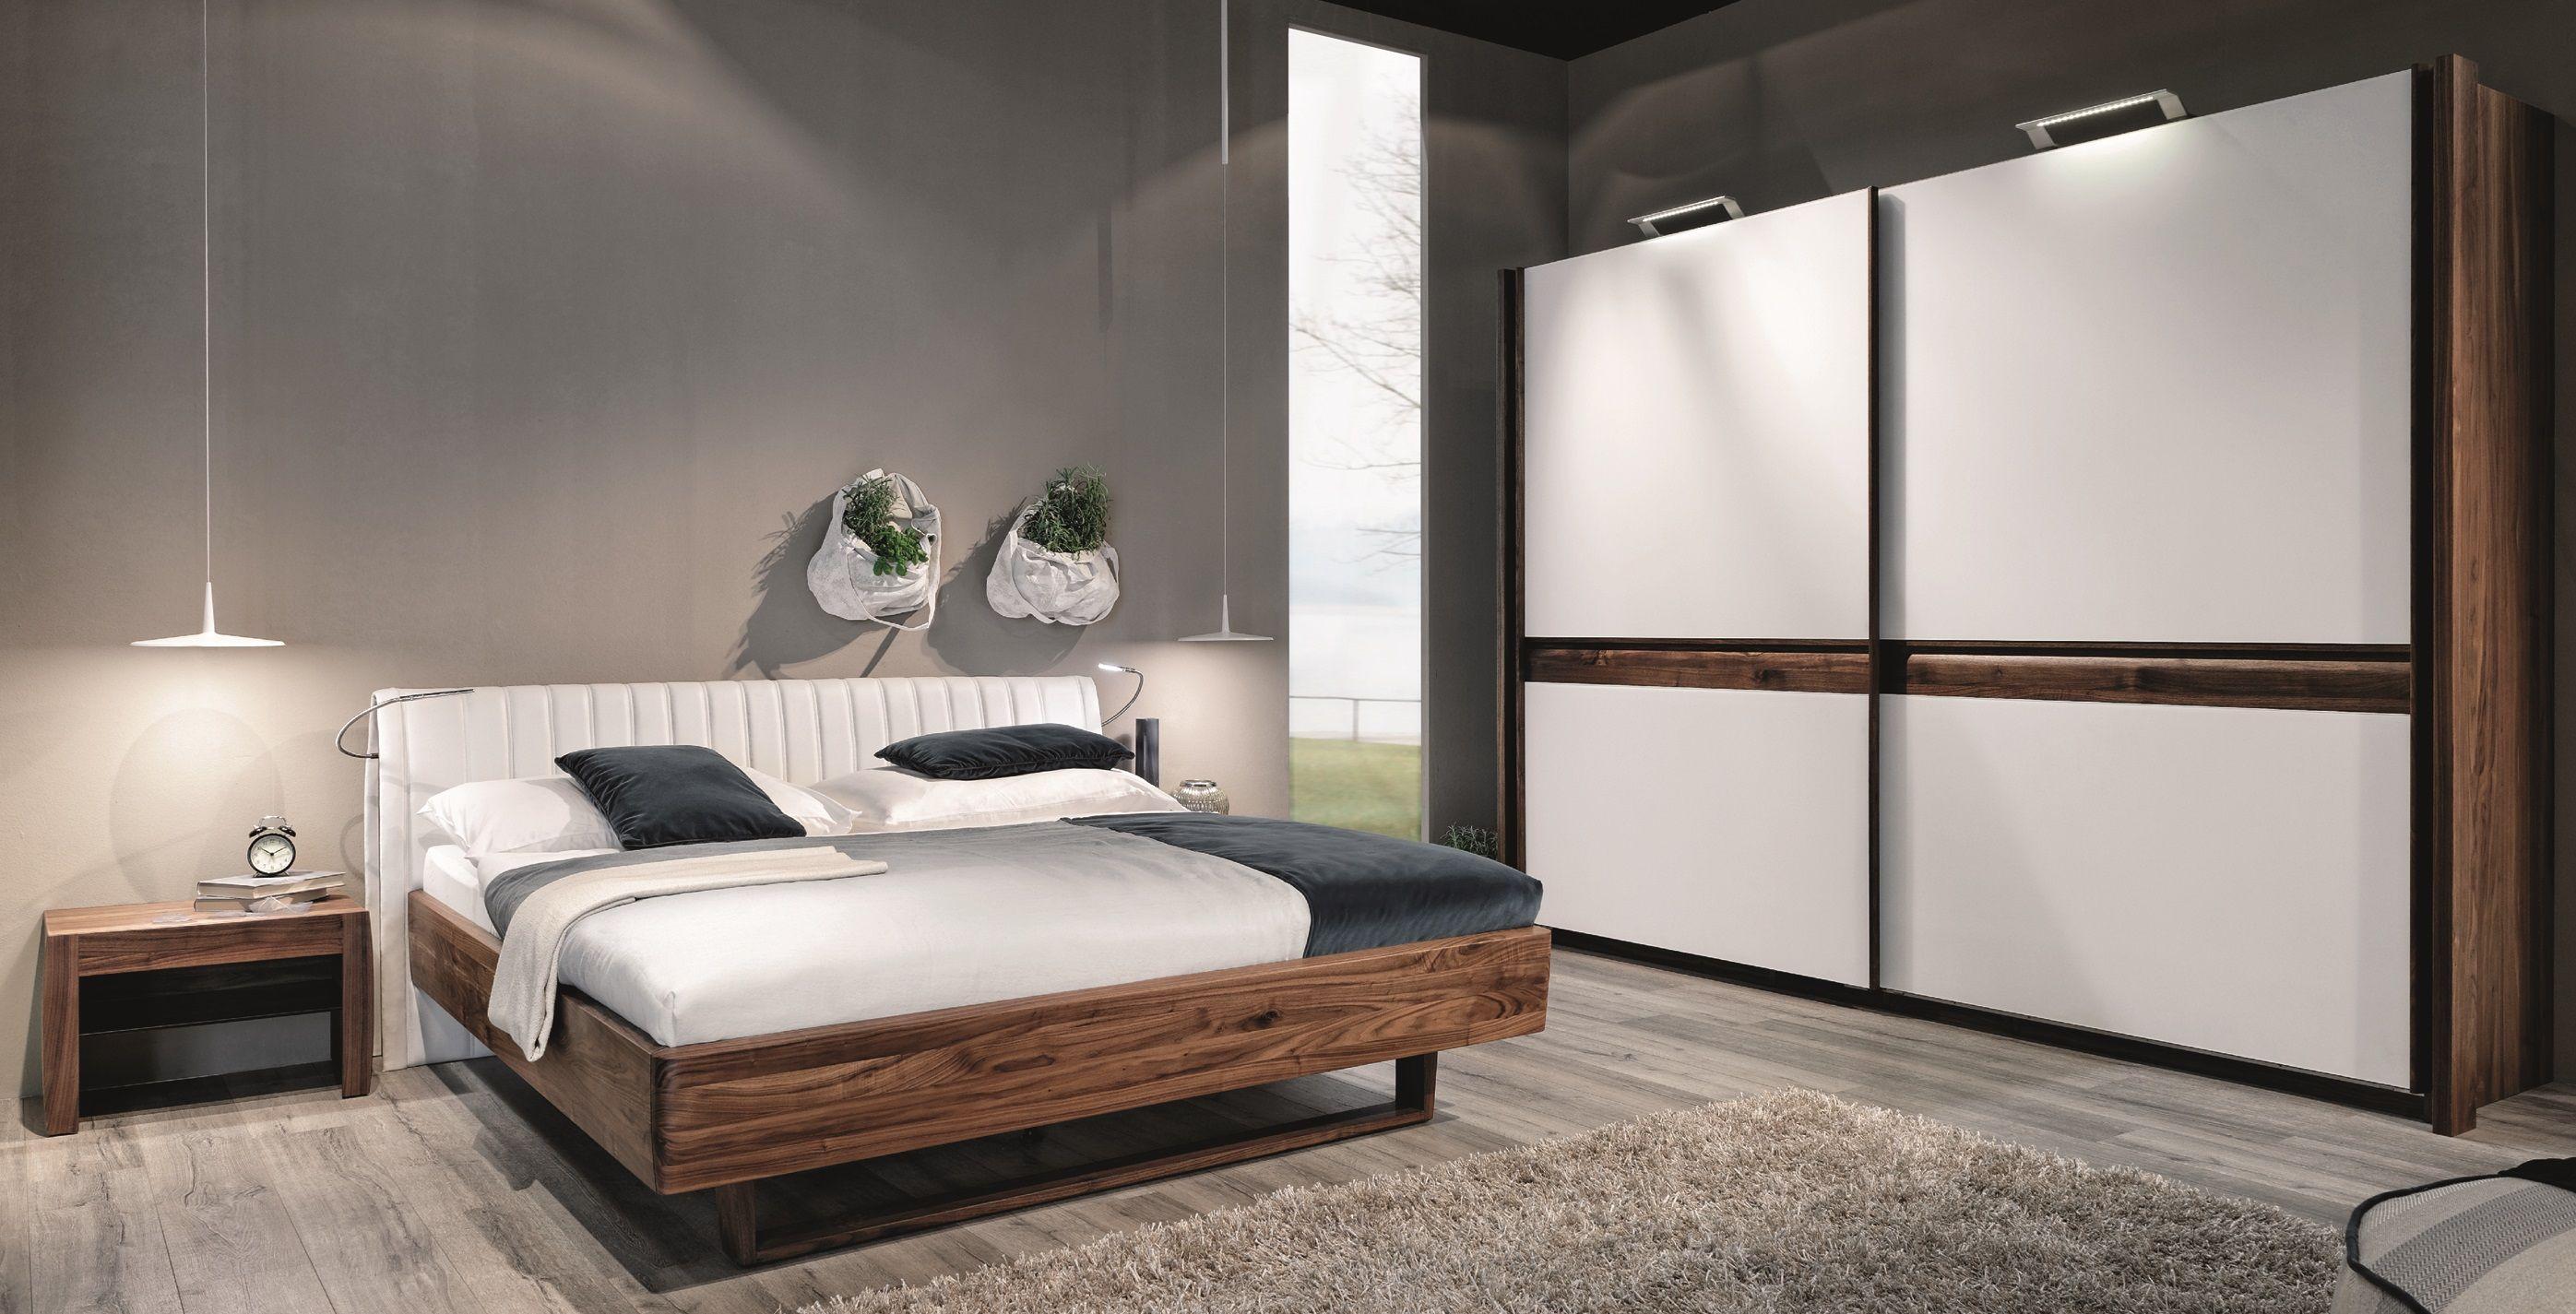 We Are Proud To Present Voglauers V Natura Line Of Bedroom